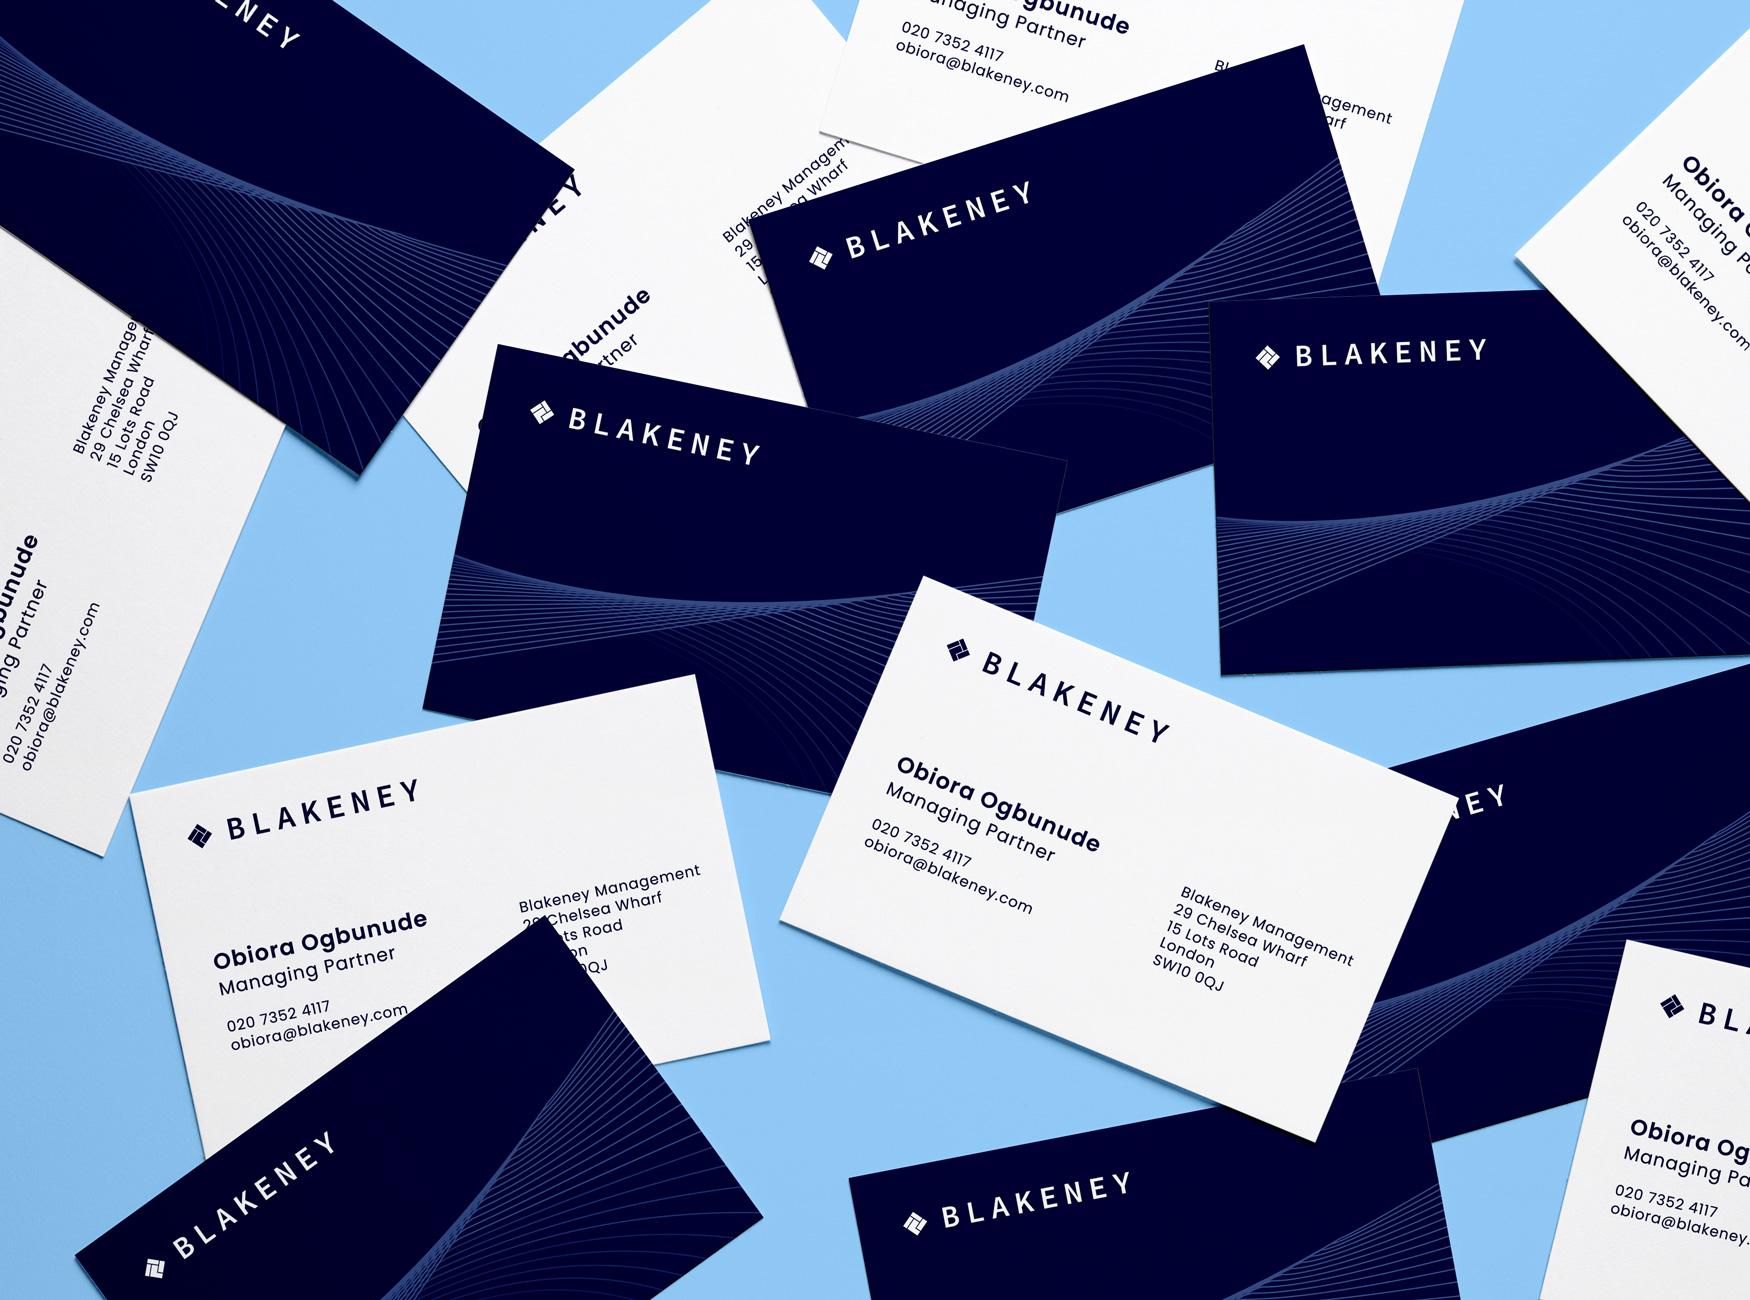 Blakeney Business Cards